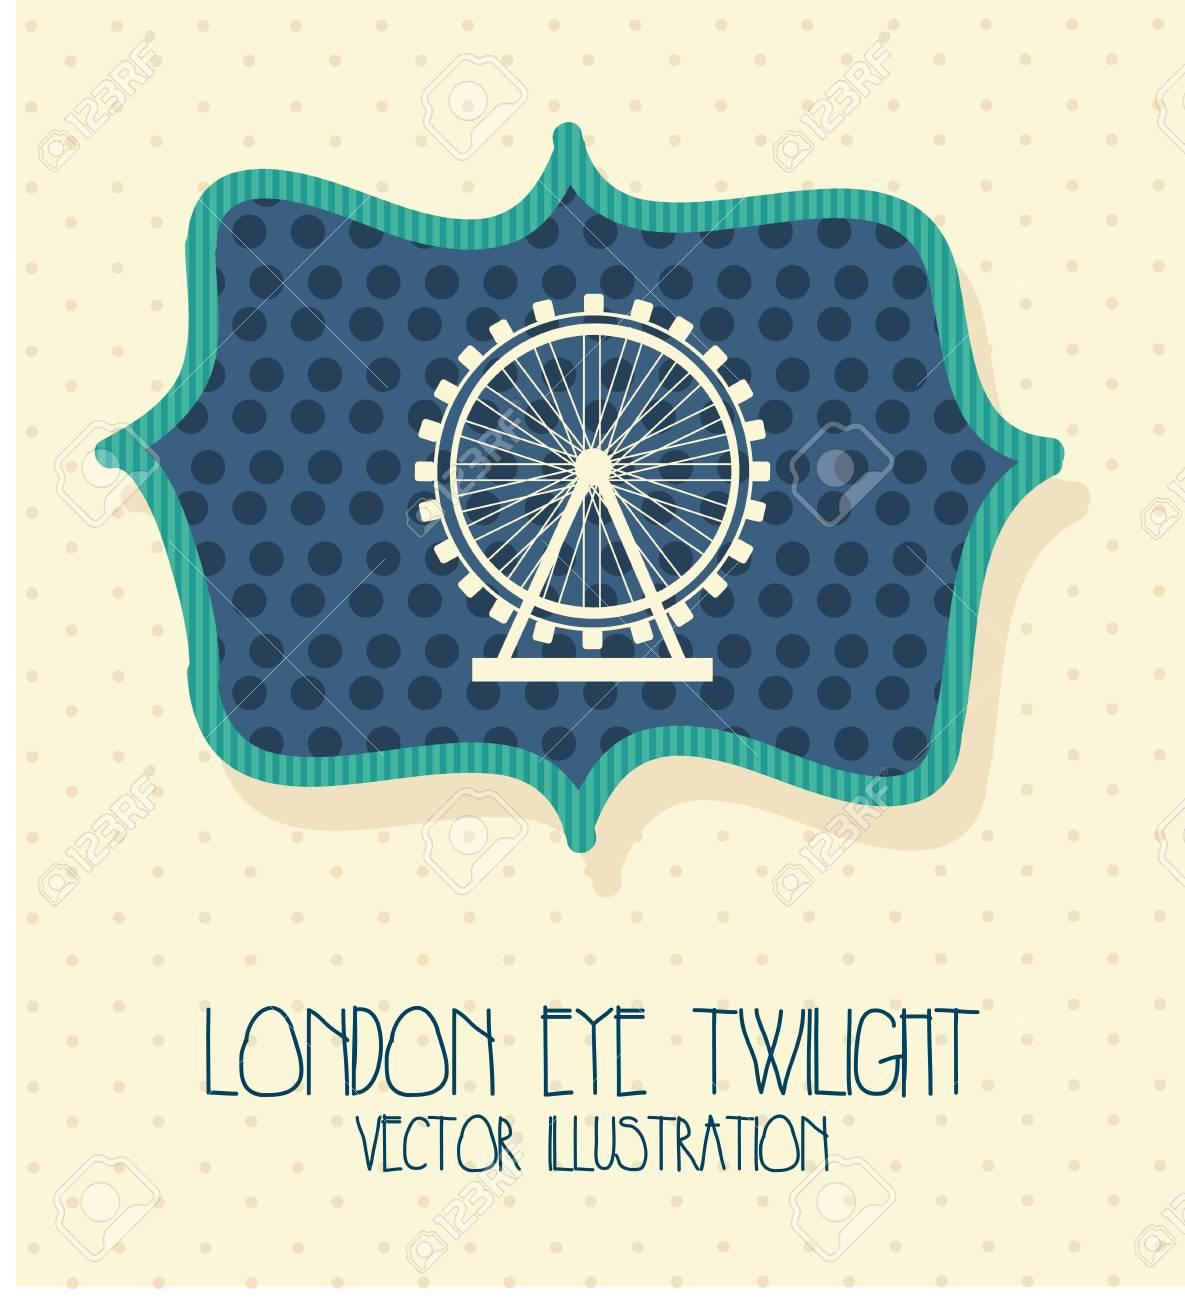 london city with eye twilight label. vector illustration Stock Vector - 17784400